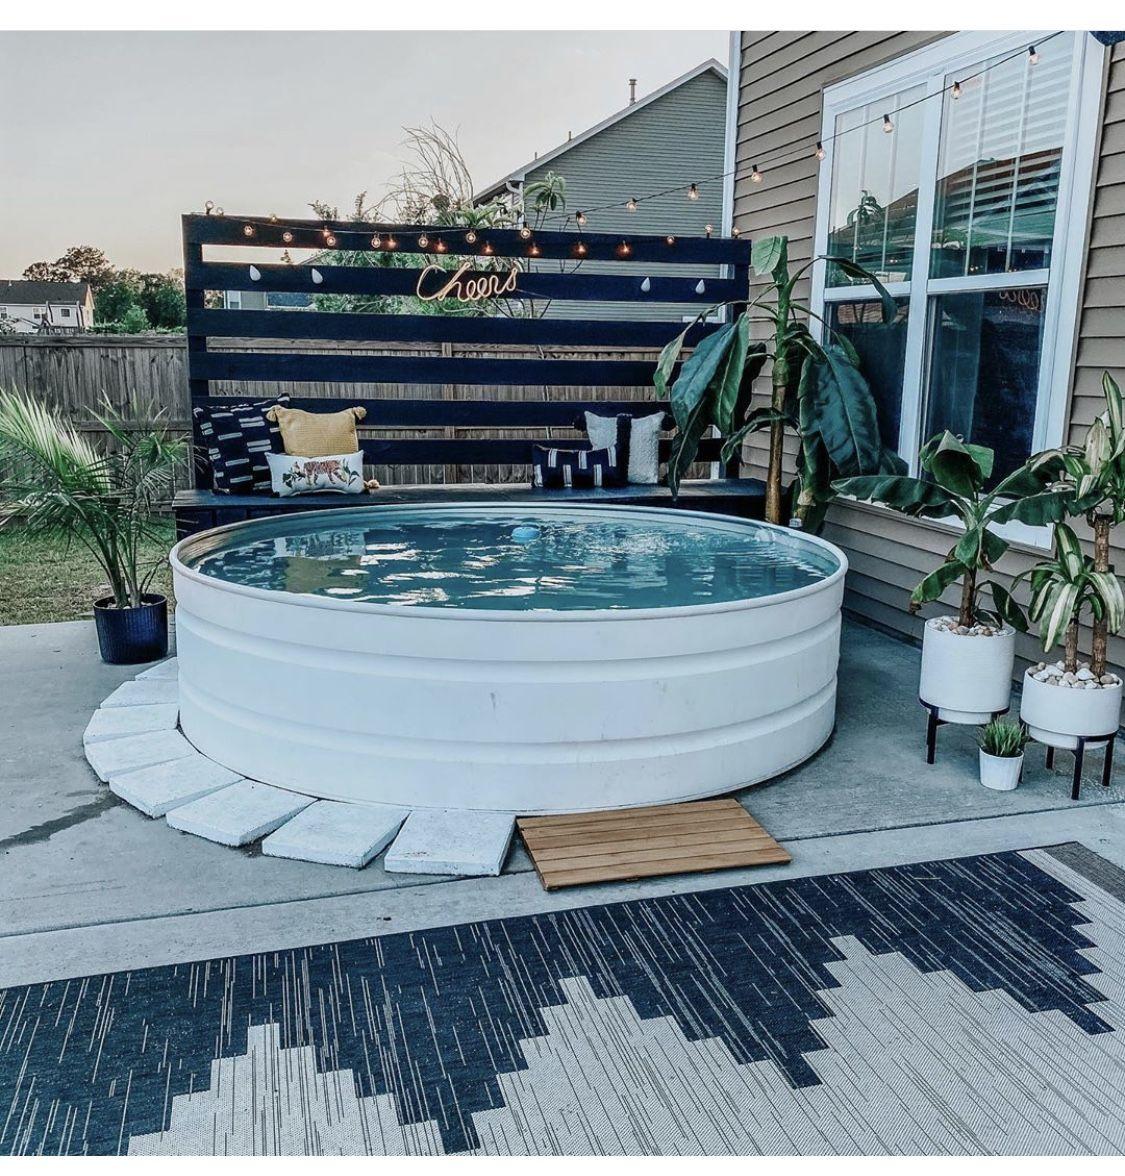 Pin By Ashley Fullen On Stock Tank Swimming Pool Backyard Inspiration Small Backyard Pools Backyard Inspo